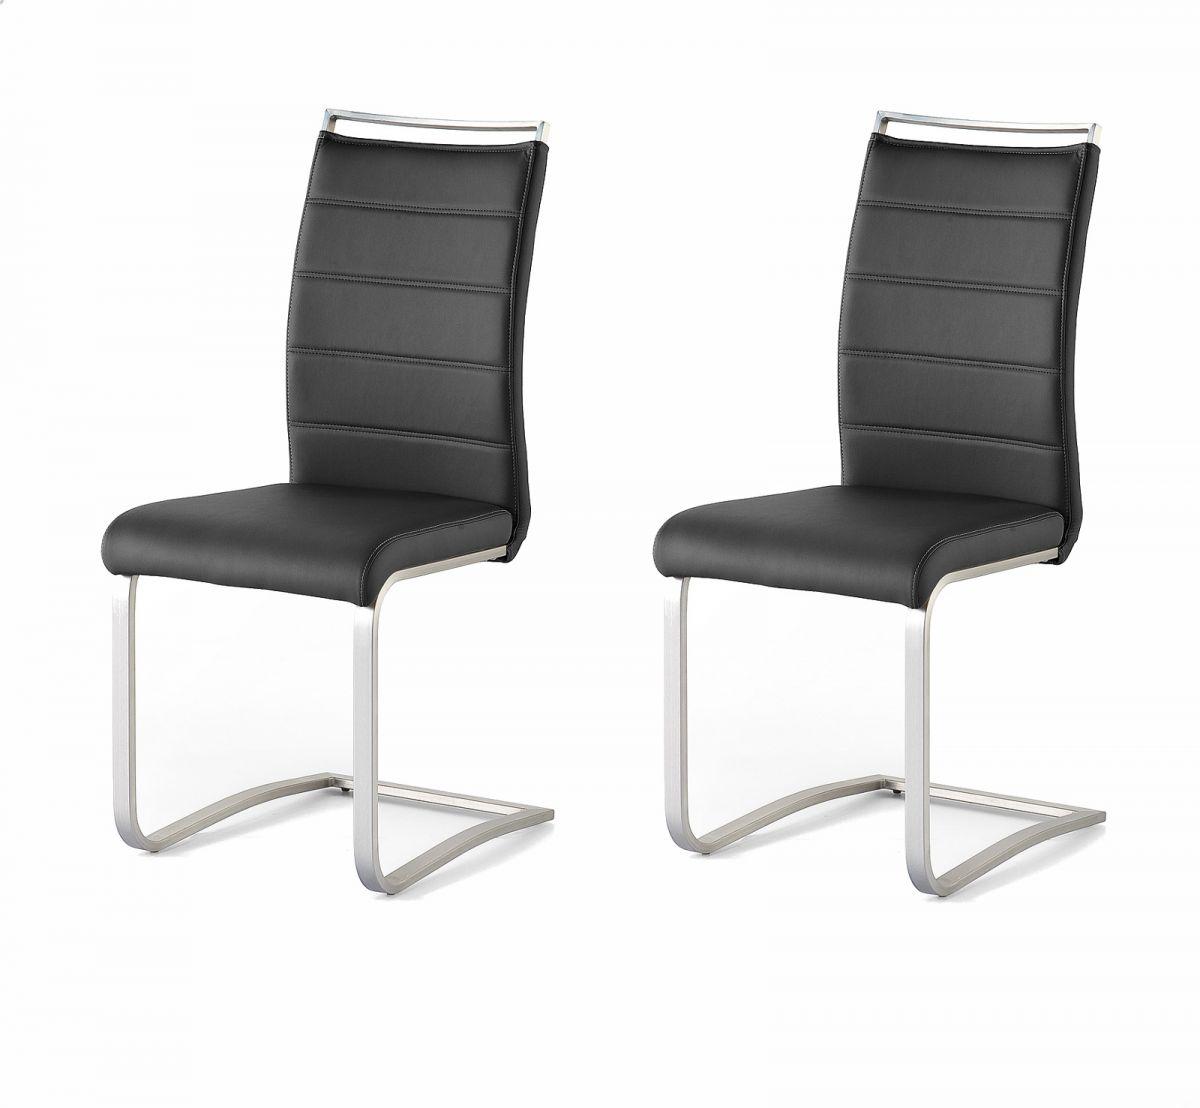 2 x Stuhl Pescara Schwarz Schwinger Kunstleder